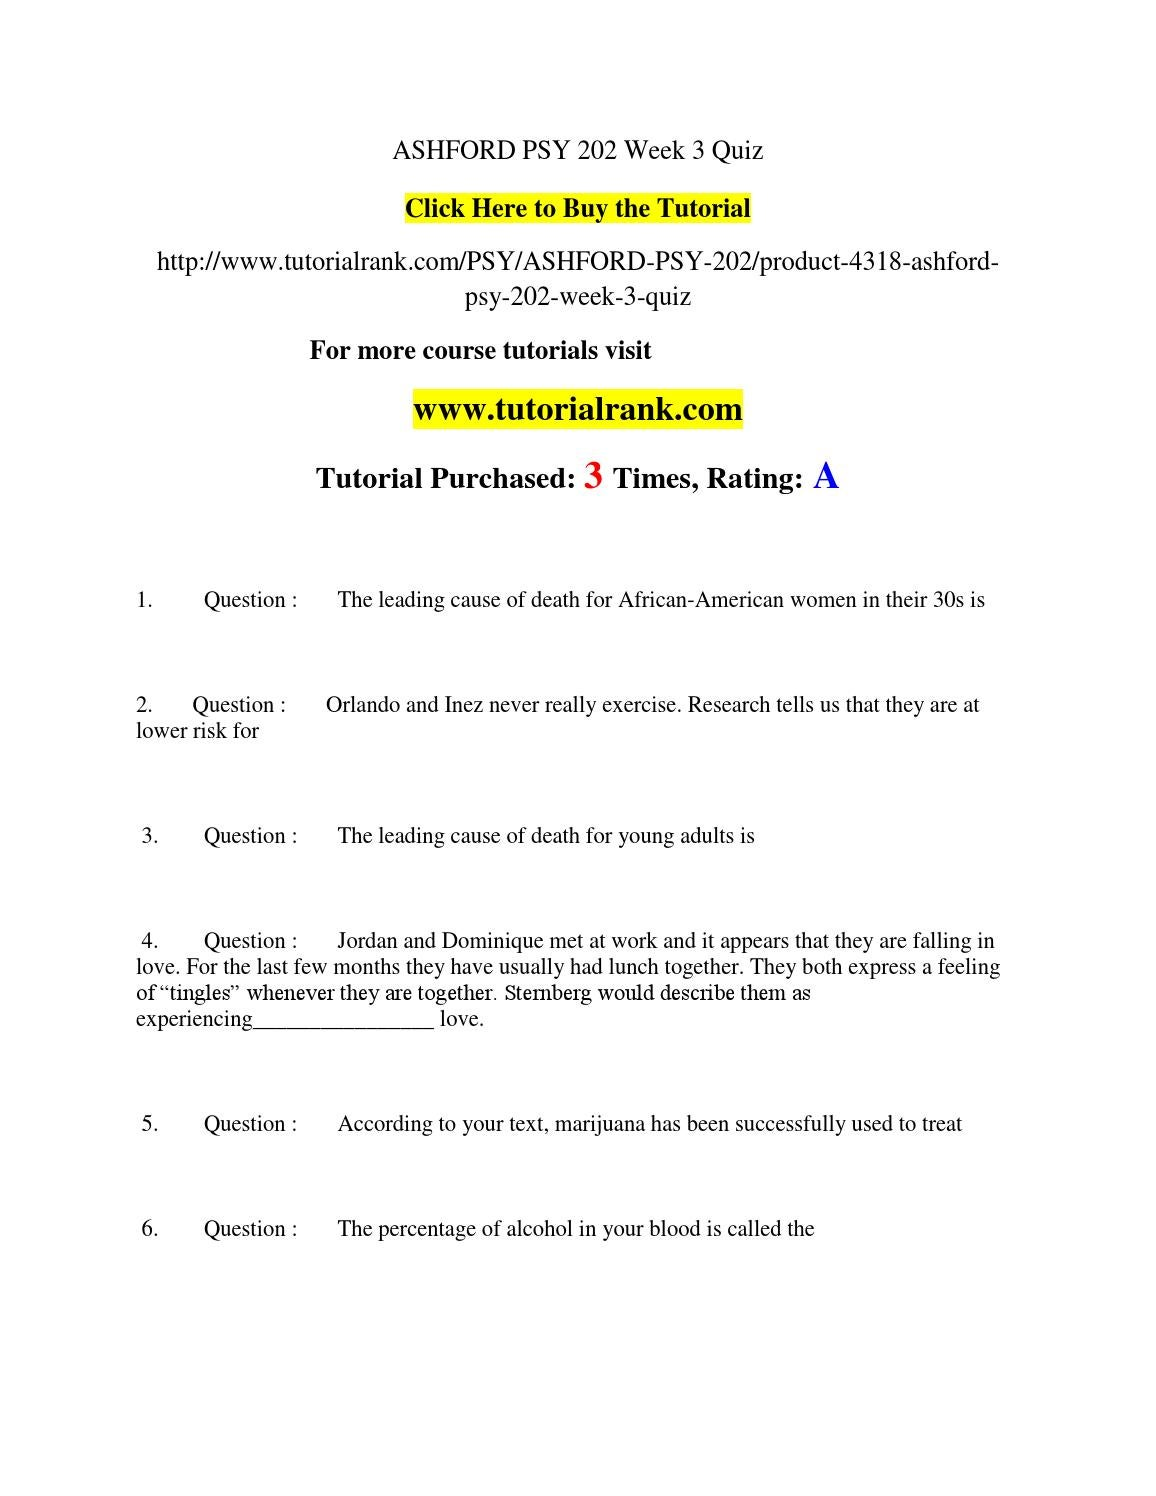 MAT221 Week 5 Content Quiz